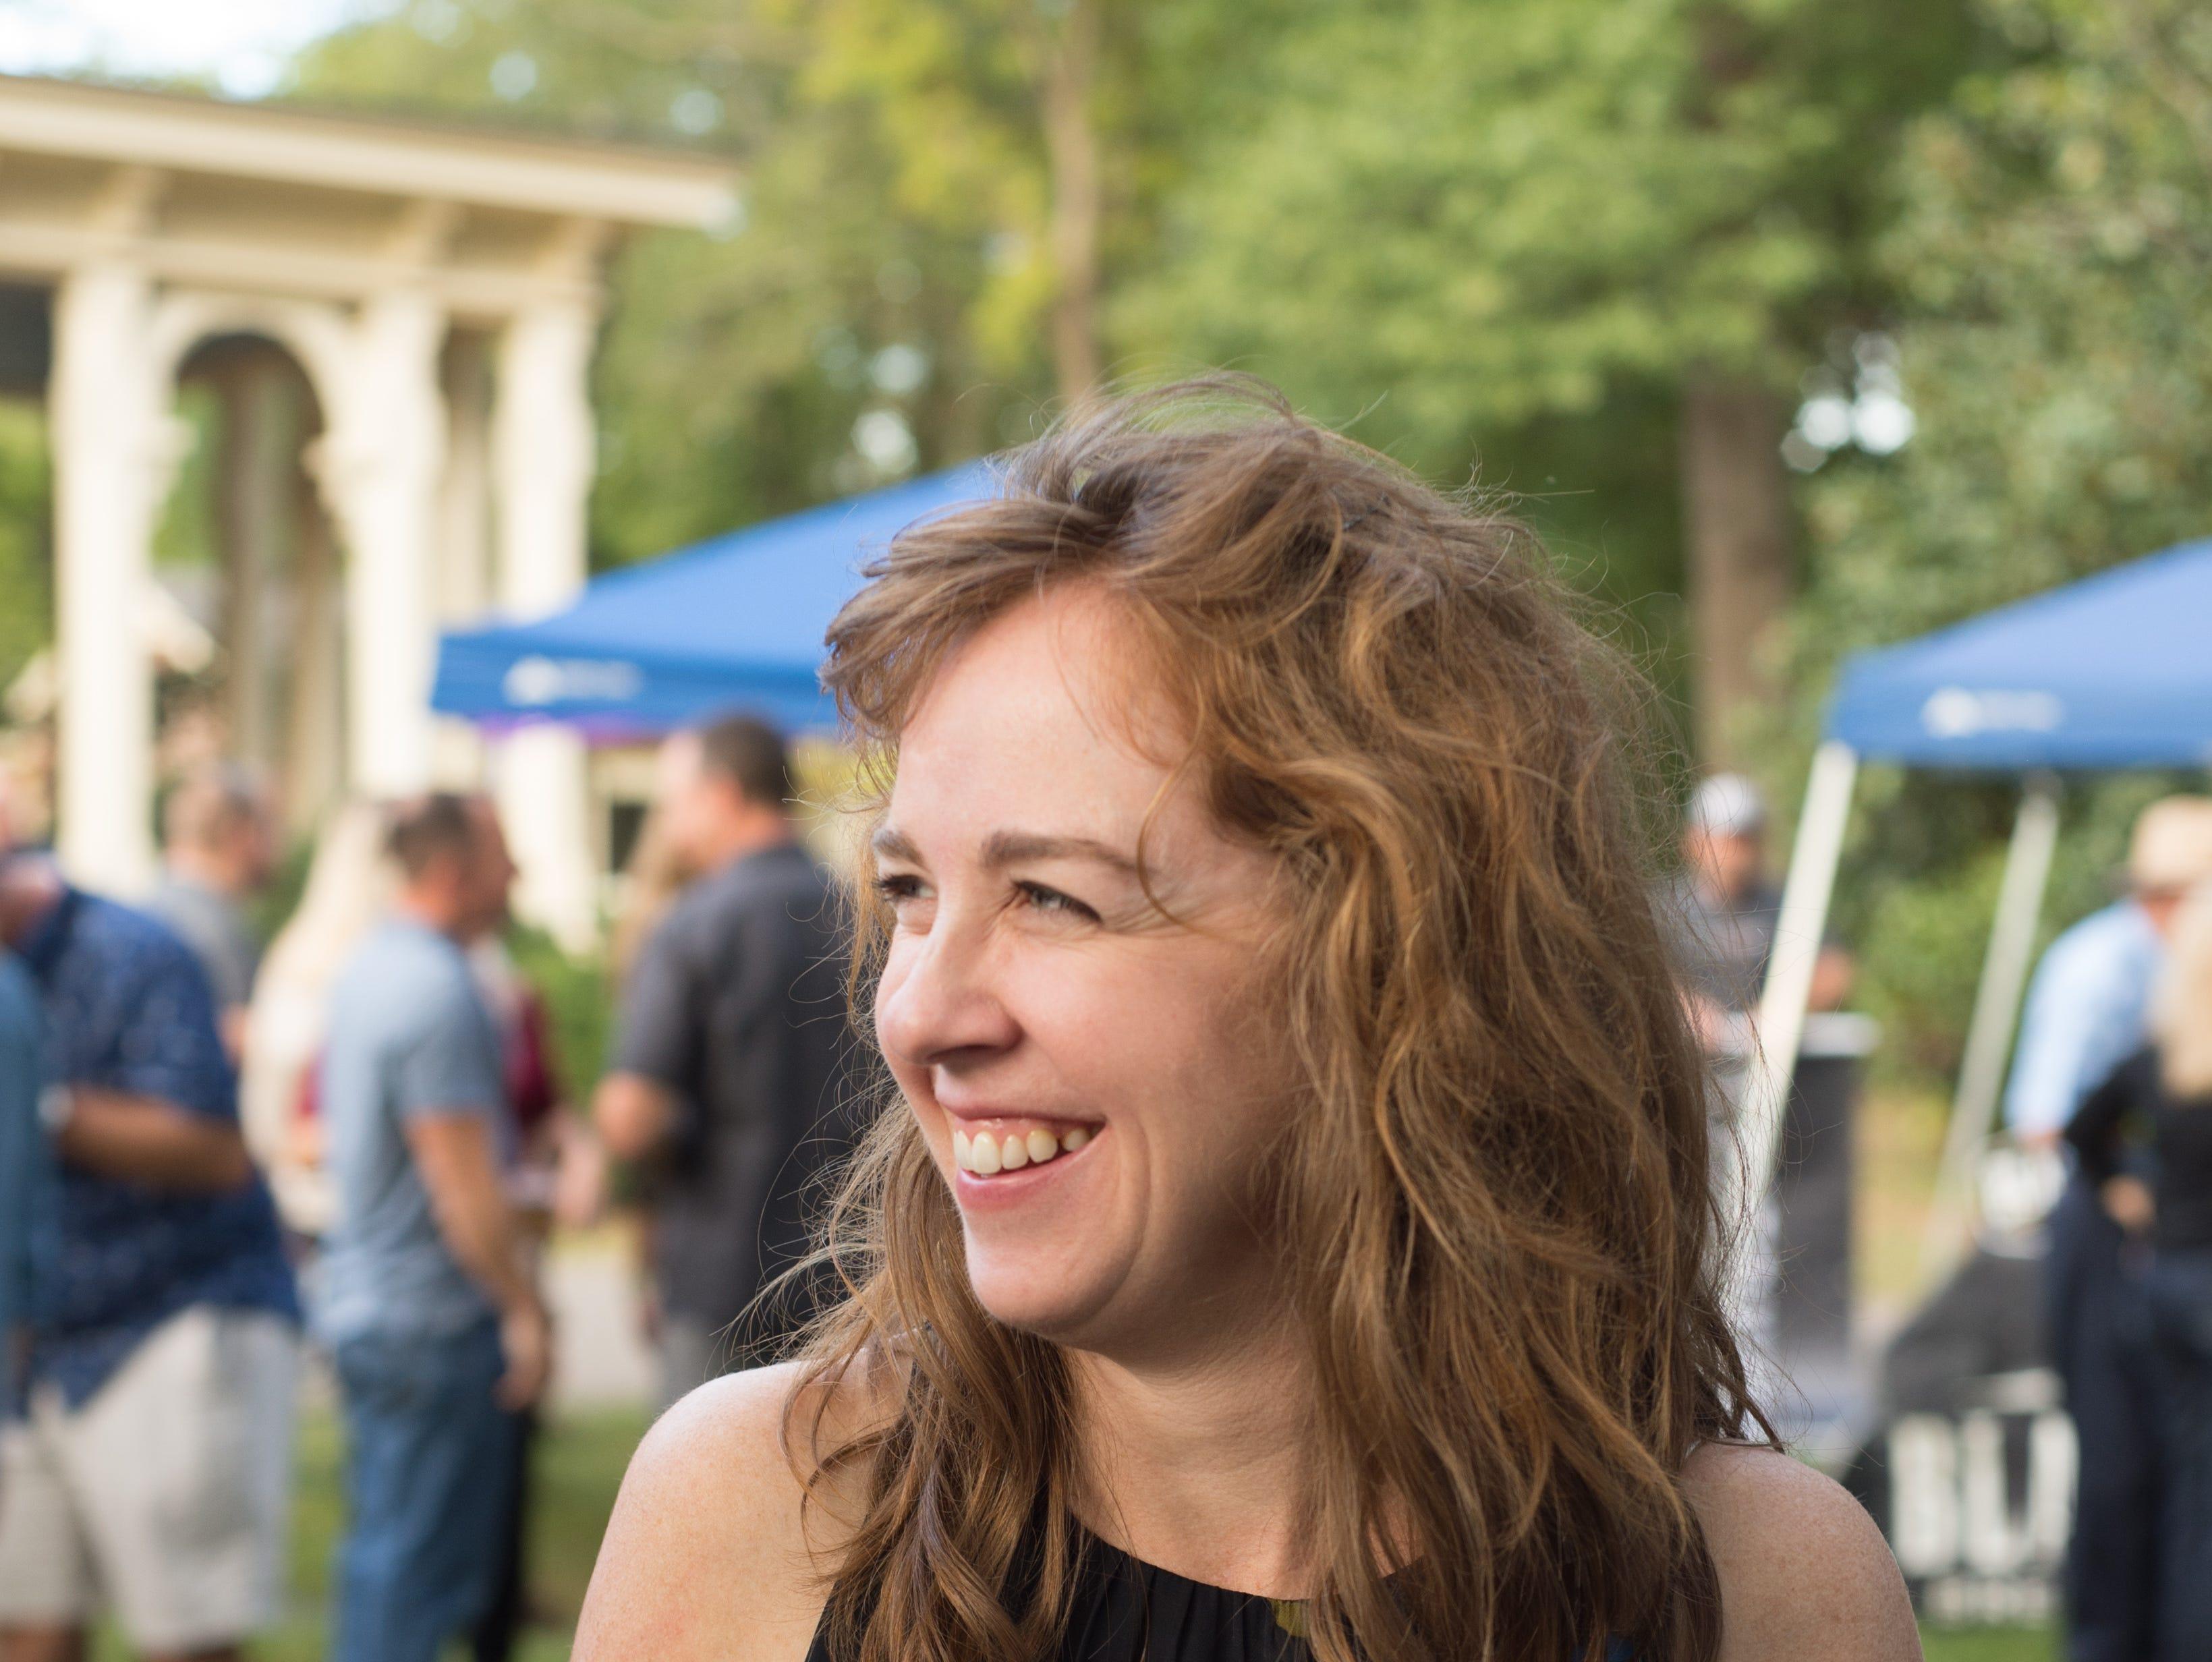 Leah Banker enjoys Oktoberfest at Oaklands Mansion in Murfreesboro on Saturday, Sept. 29.